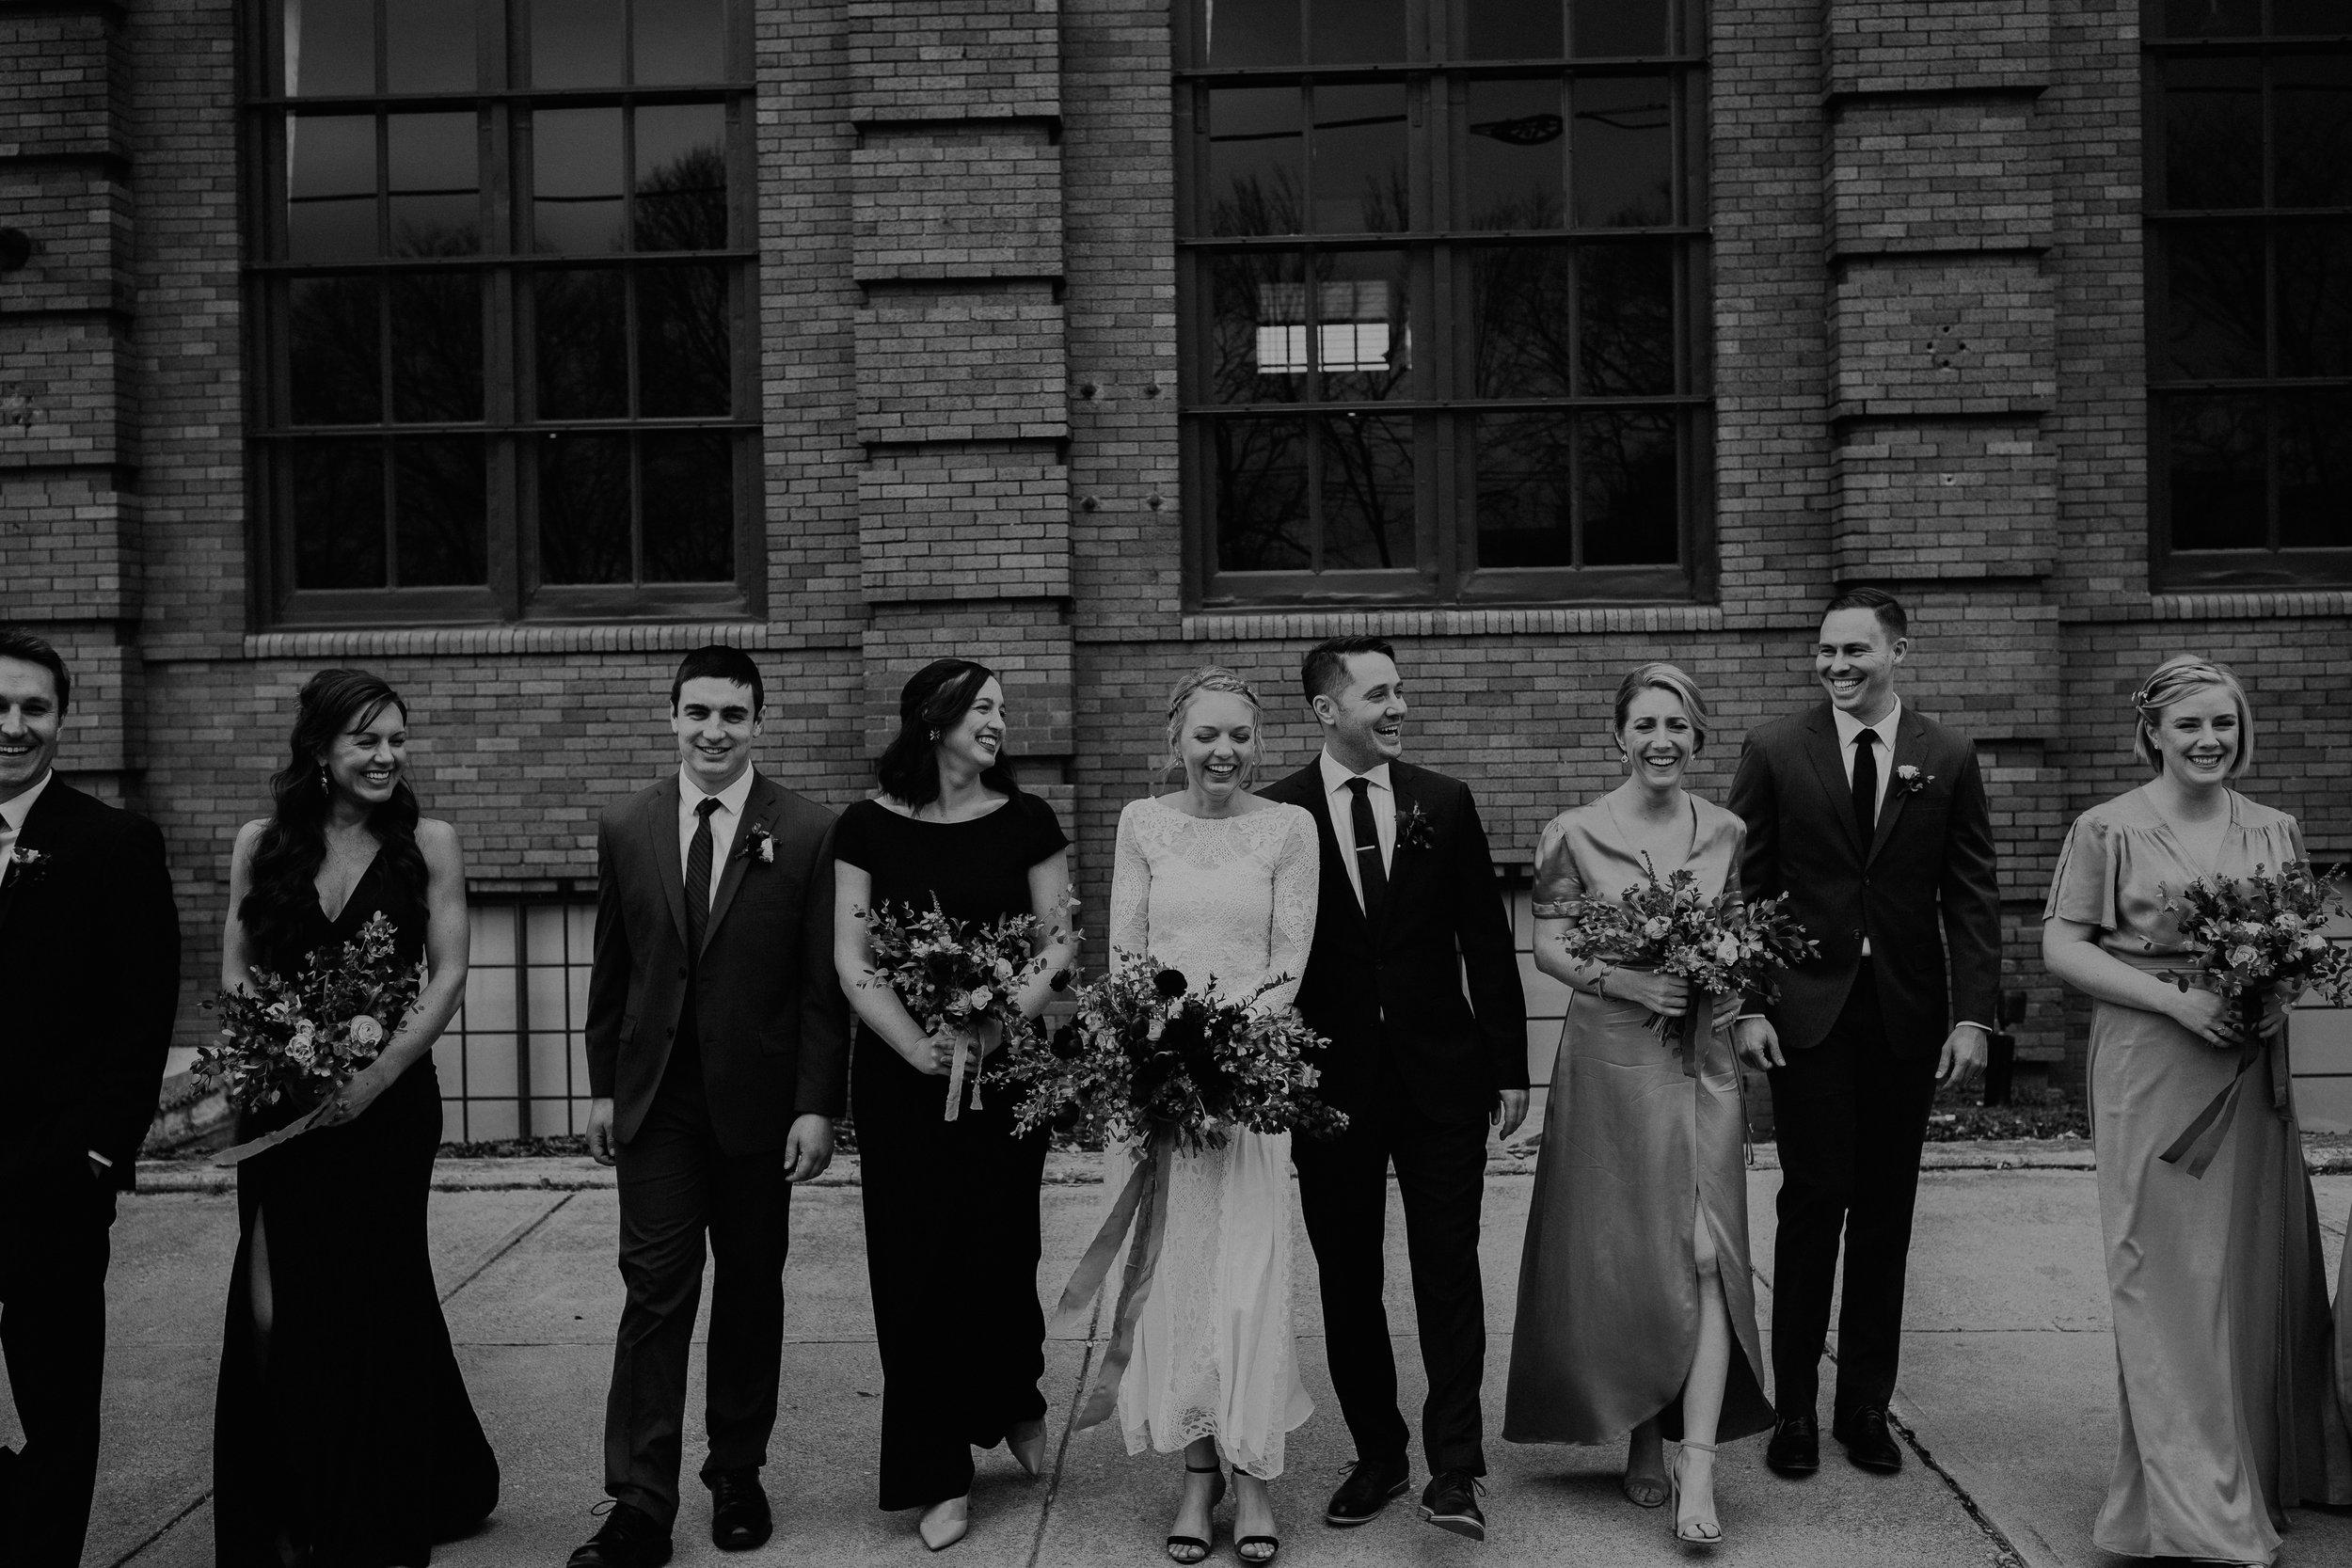 The_Steam_Plant_Dayton_Wedding-EDIT-204.jpg